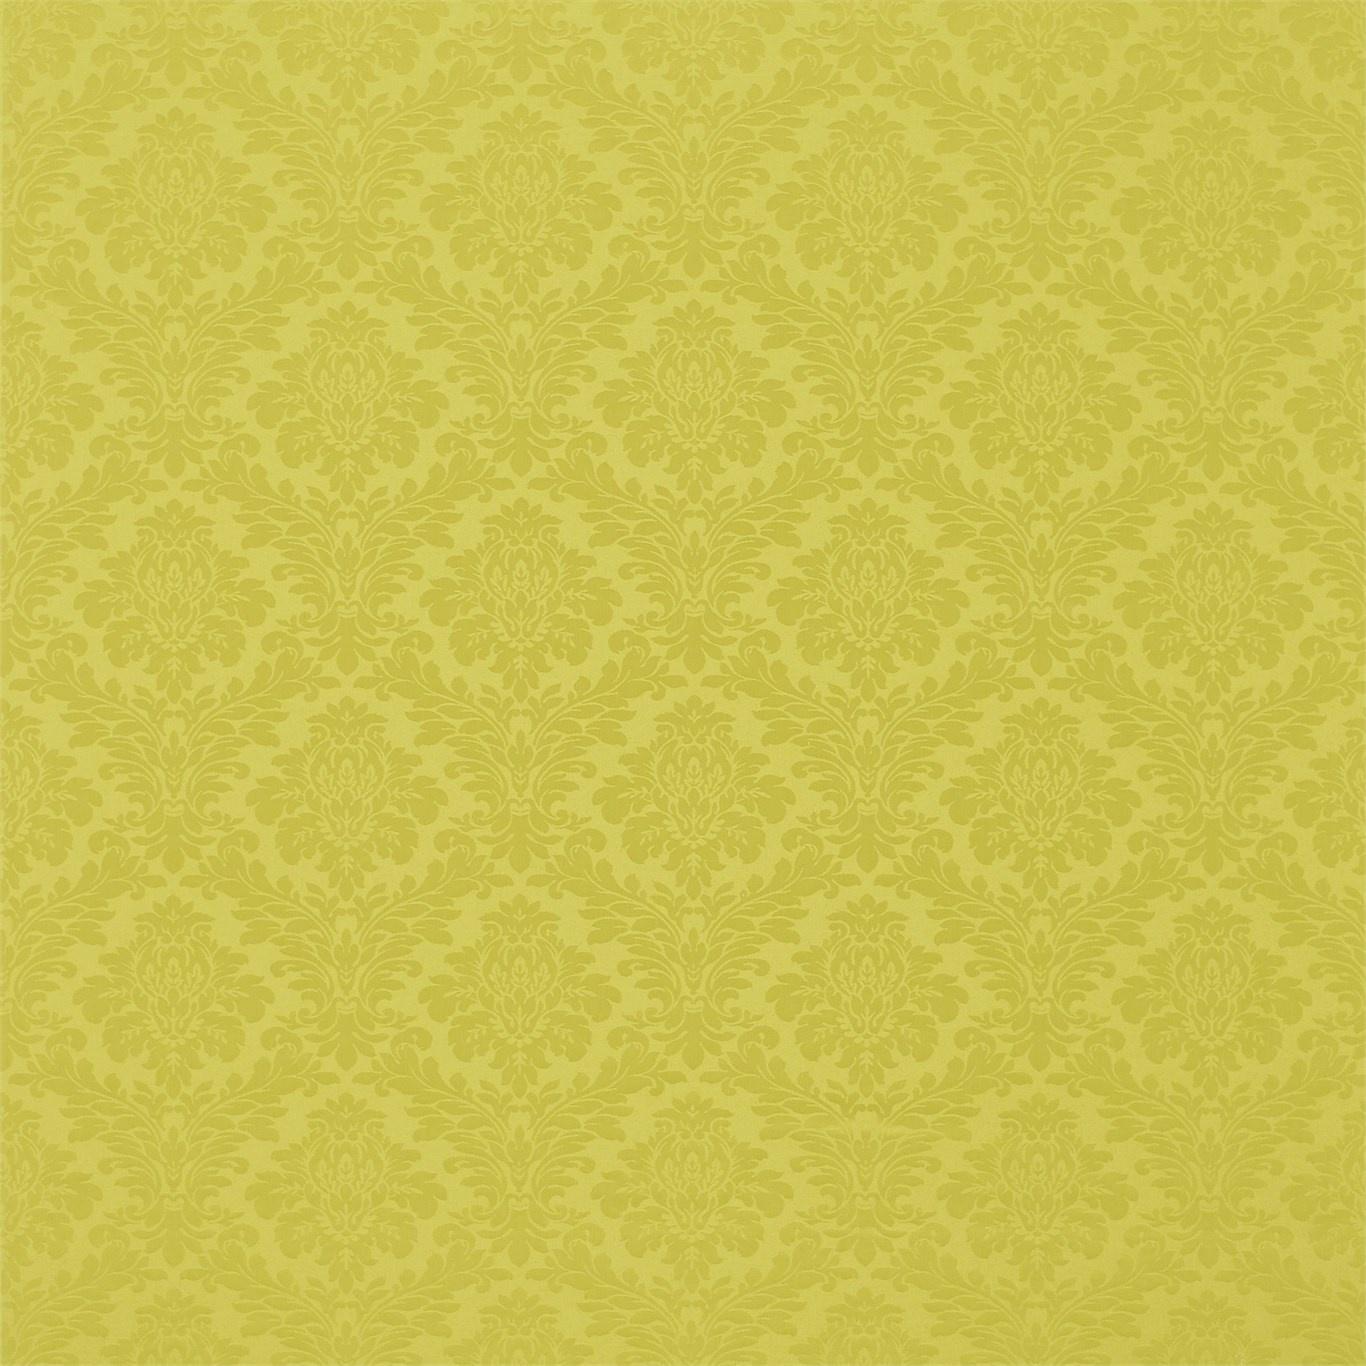 Image of Sanderson Lymington Damask Chartreuse Fabric 232624